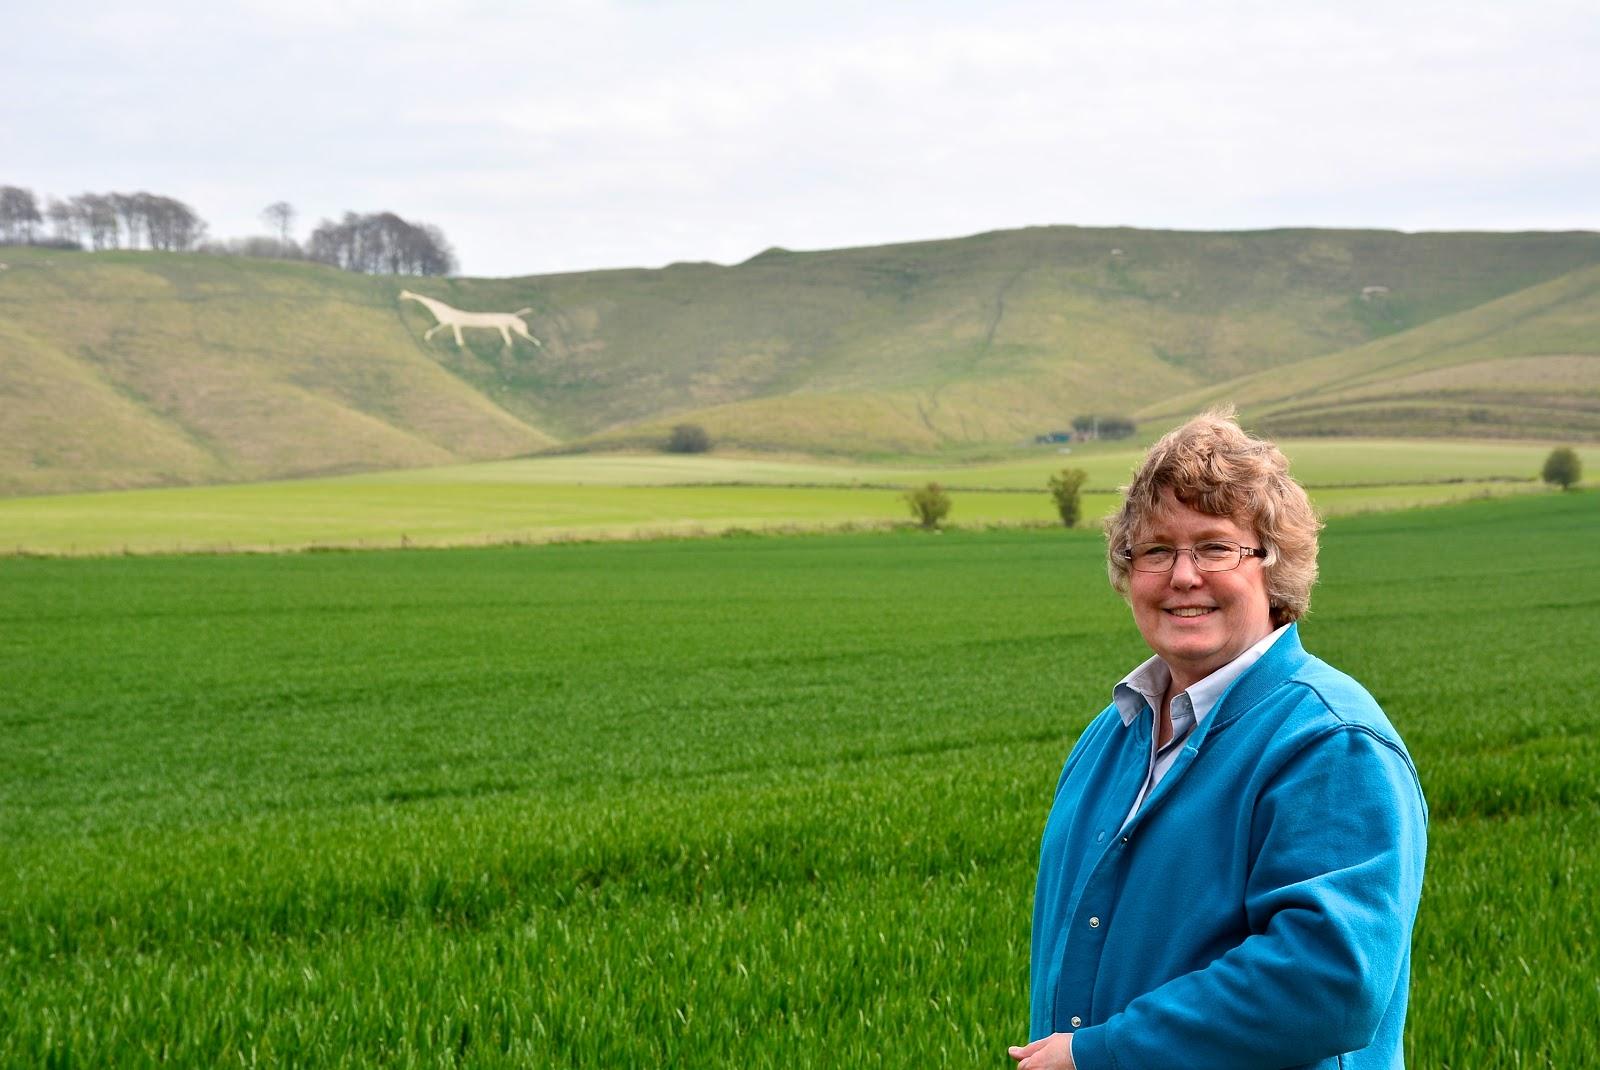 Nana at Cherhill White Horse in Wiltshire